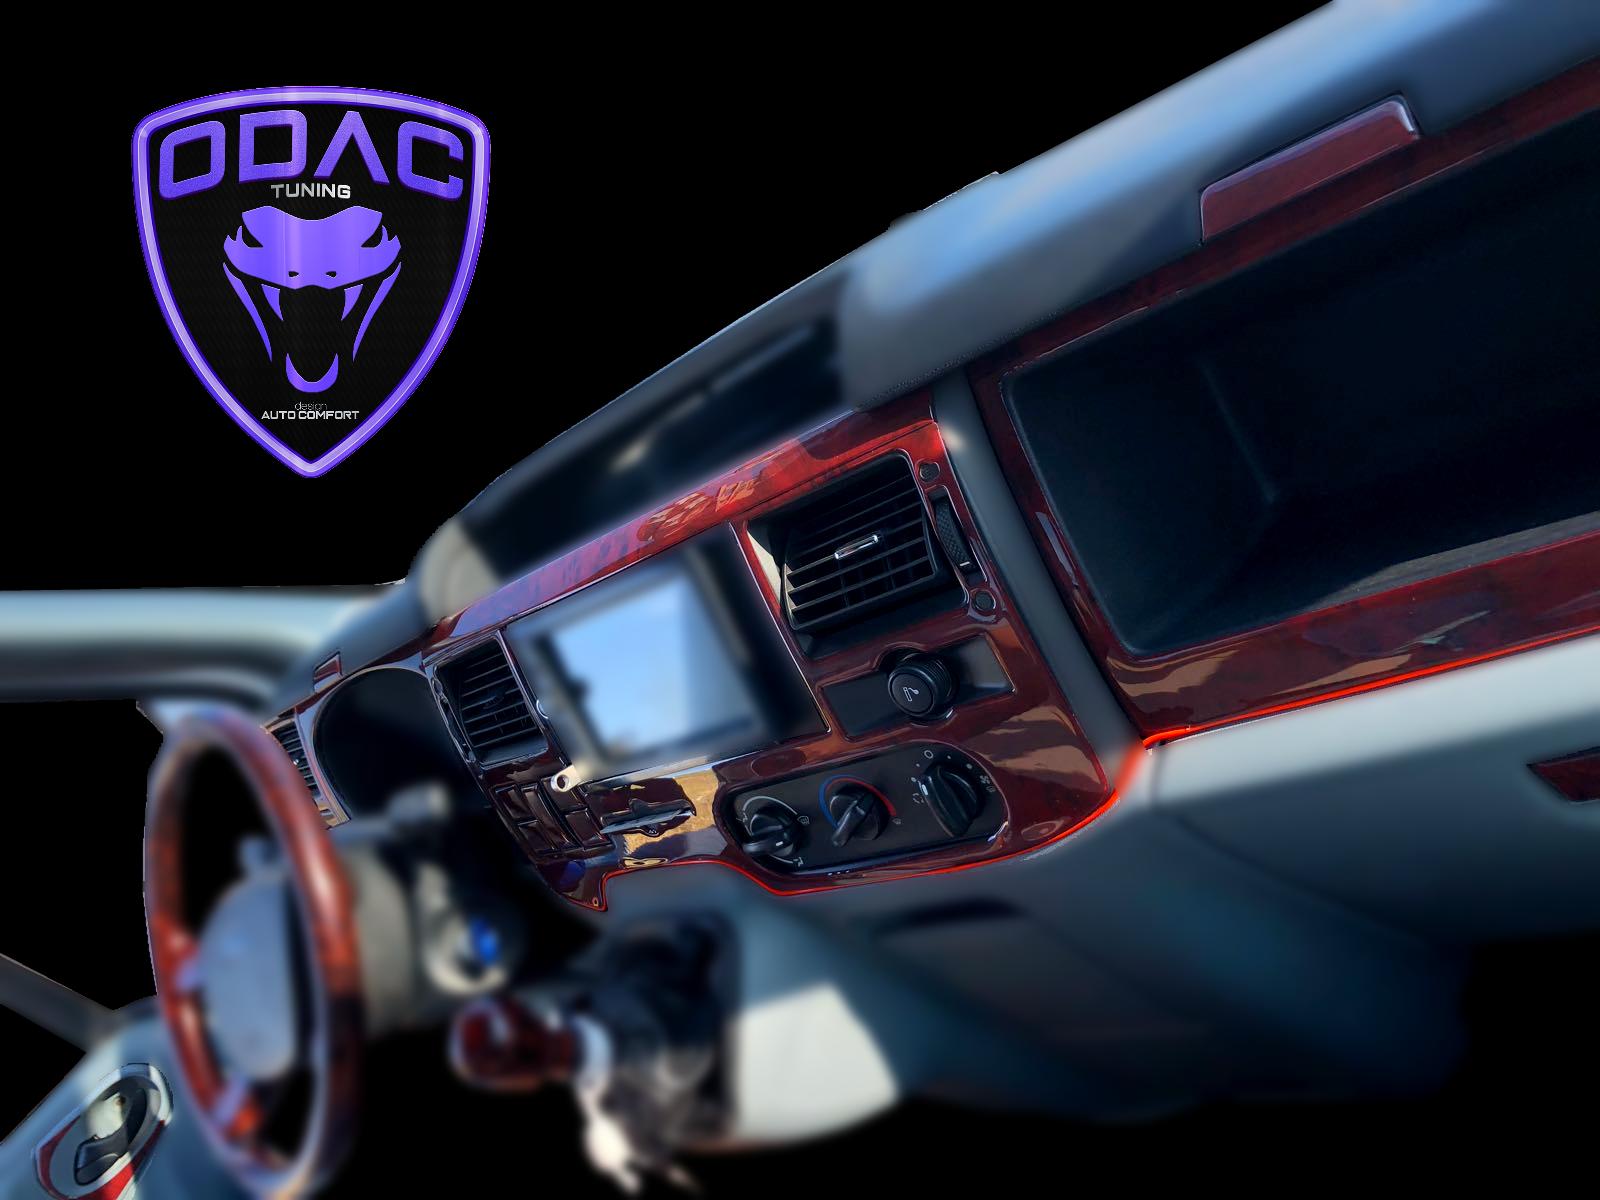 For Ford Transit 2006-2014 Dash Kit, Cockpit Decor, 5D Interior Trim Stickers, Torpedo Coating, Cover, Vehicele, Car Accessory enlarge